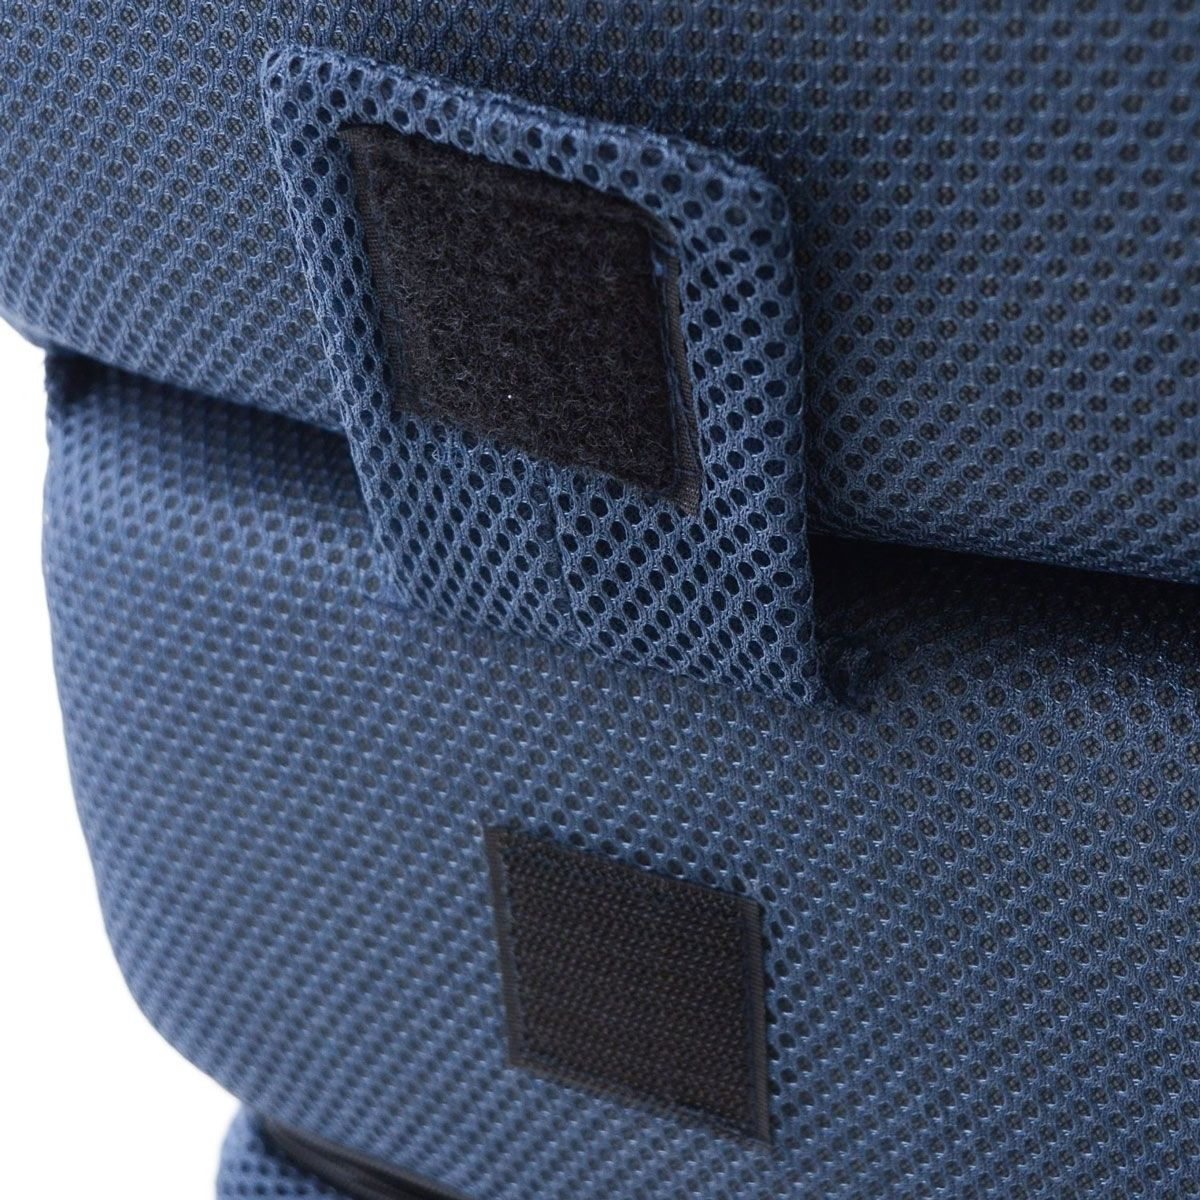 TriFold Foam Folding Mattress & Sofa Bed Folding